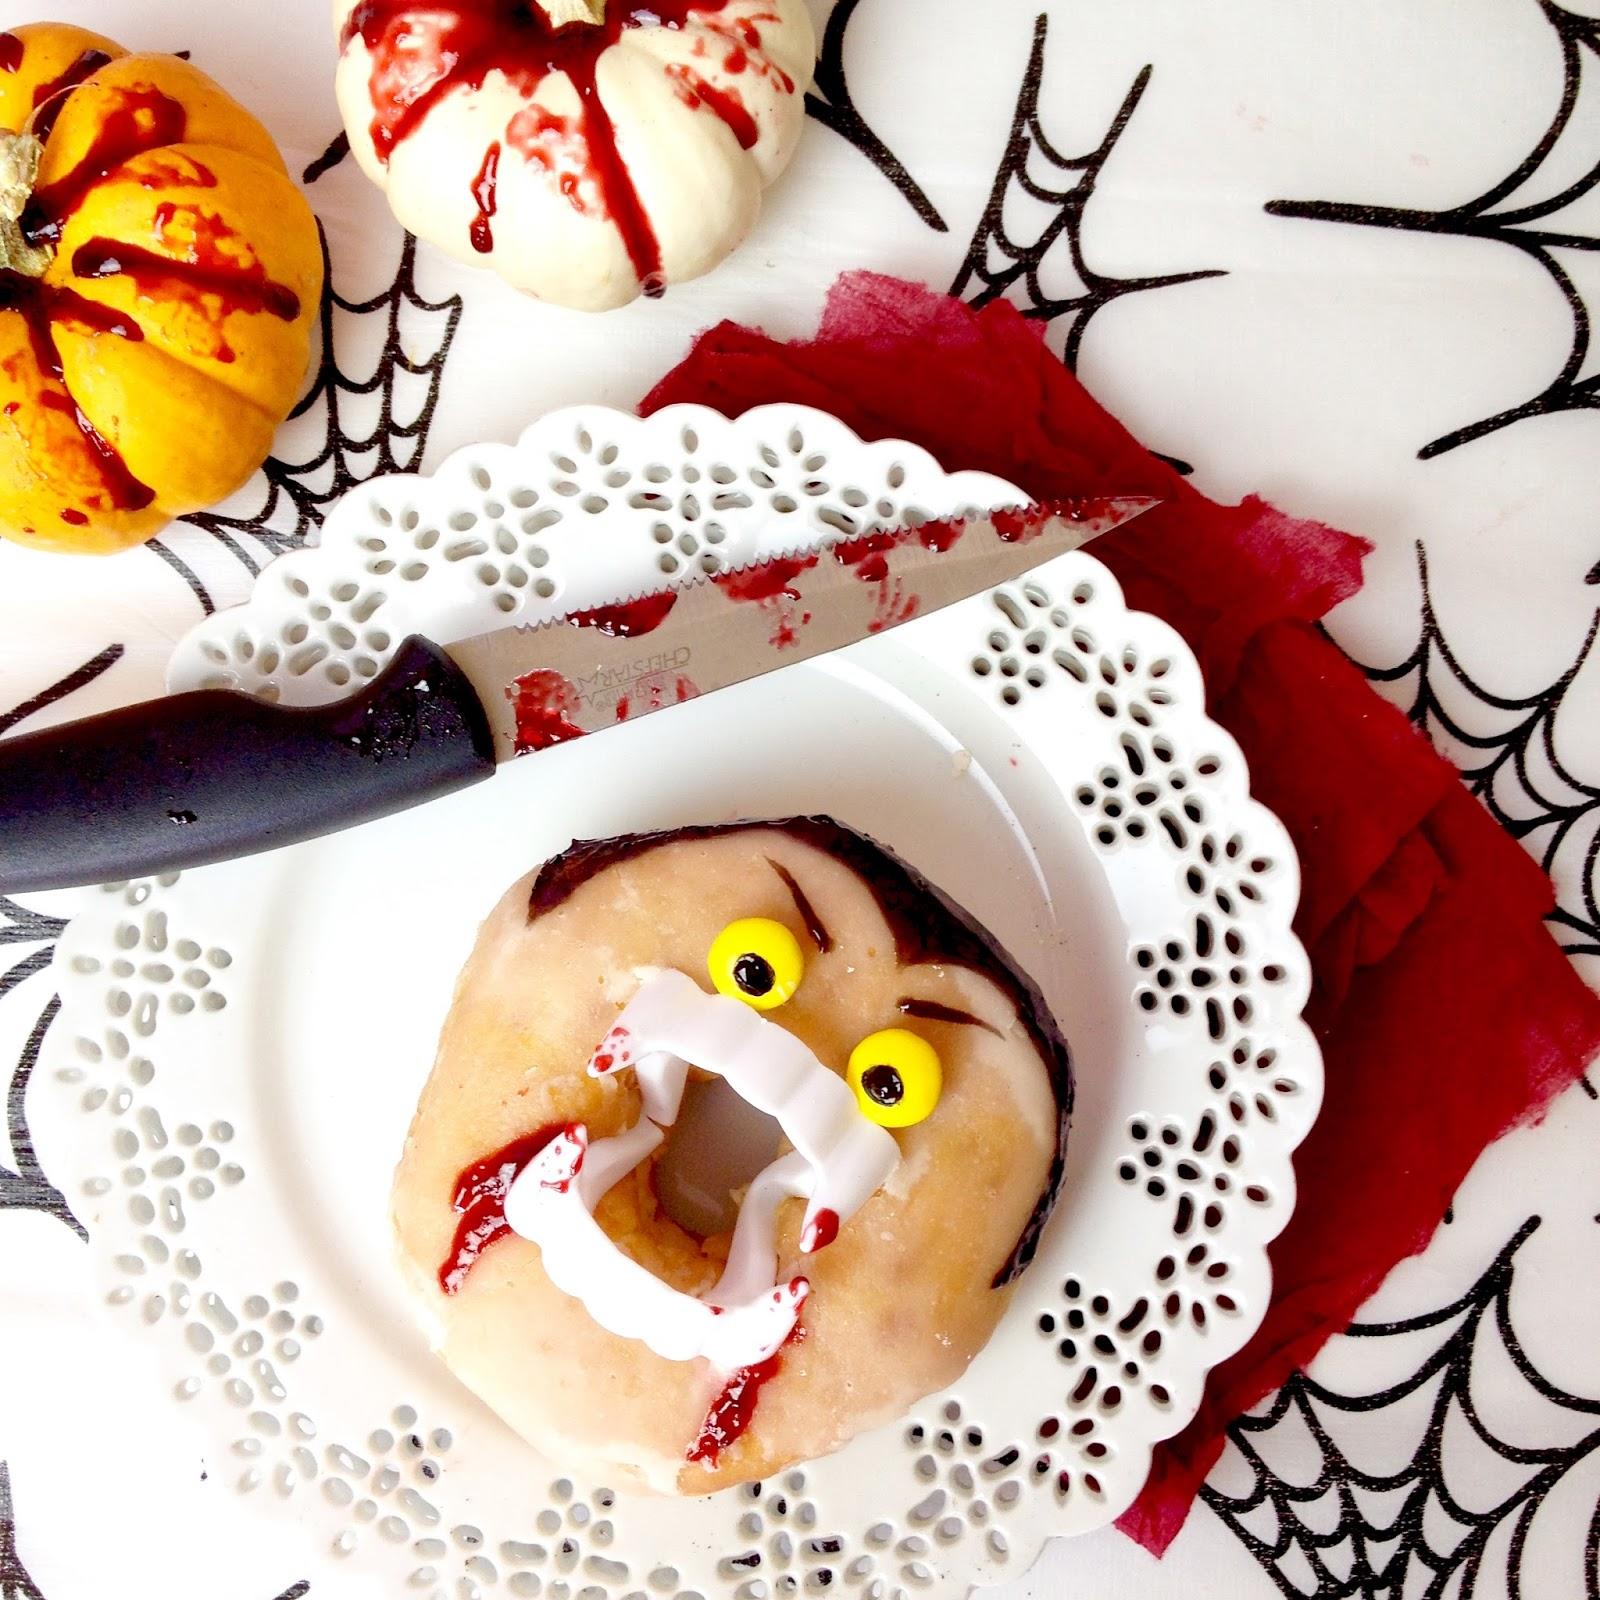 video} halloween vampire doughnuts (dracula donuts) - lindsay ann bakes